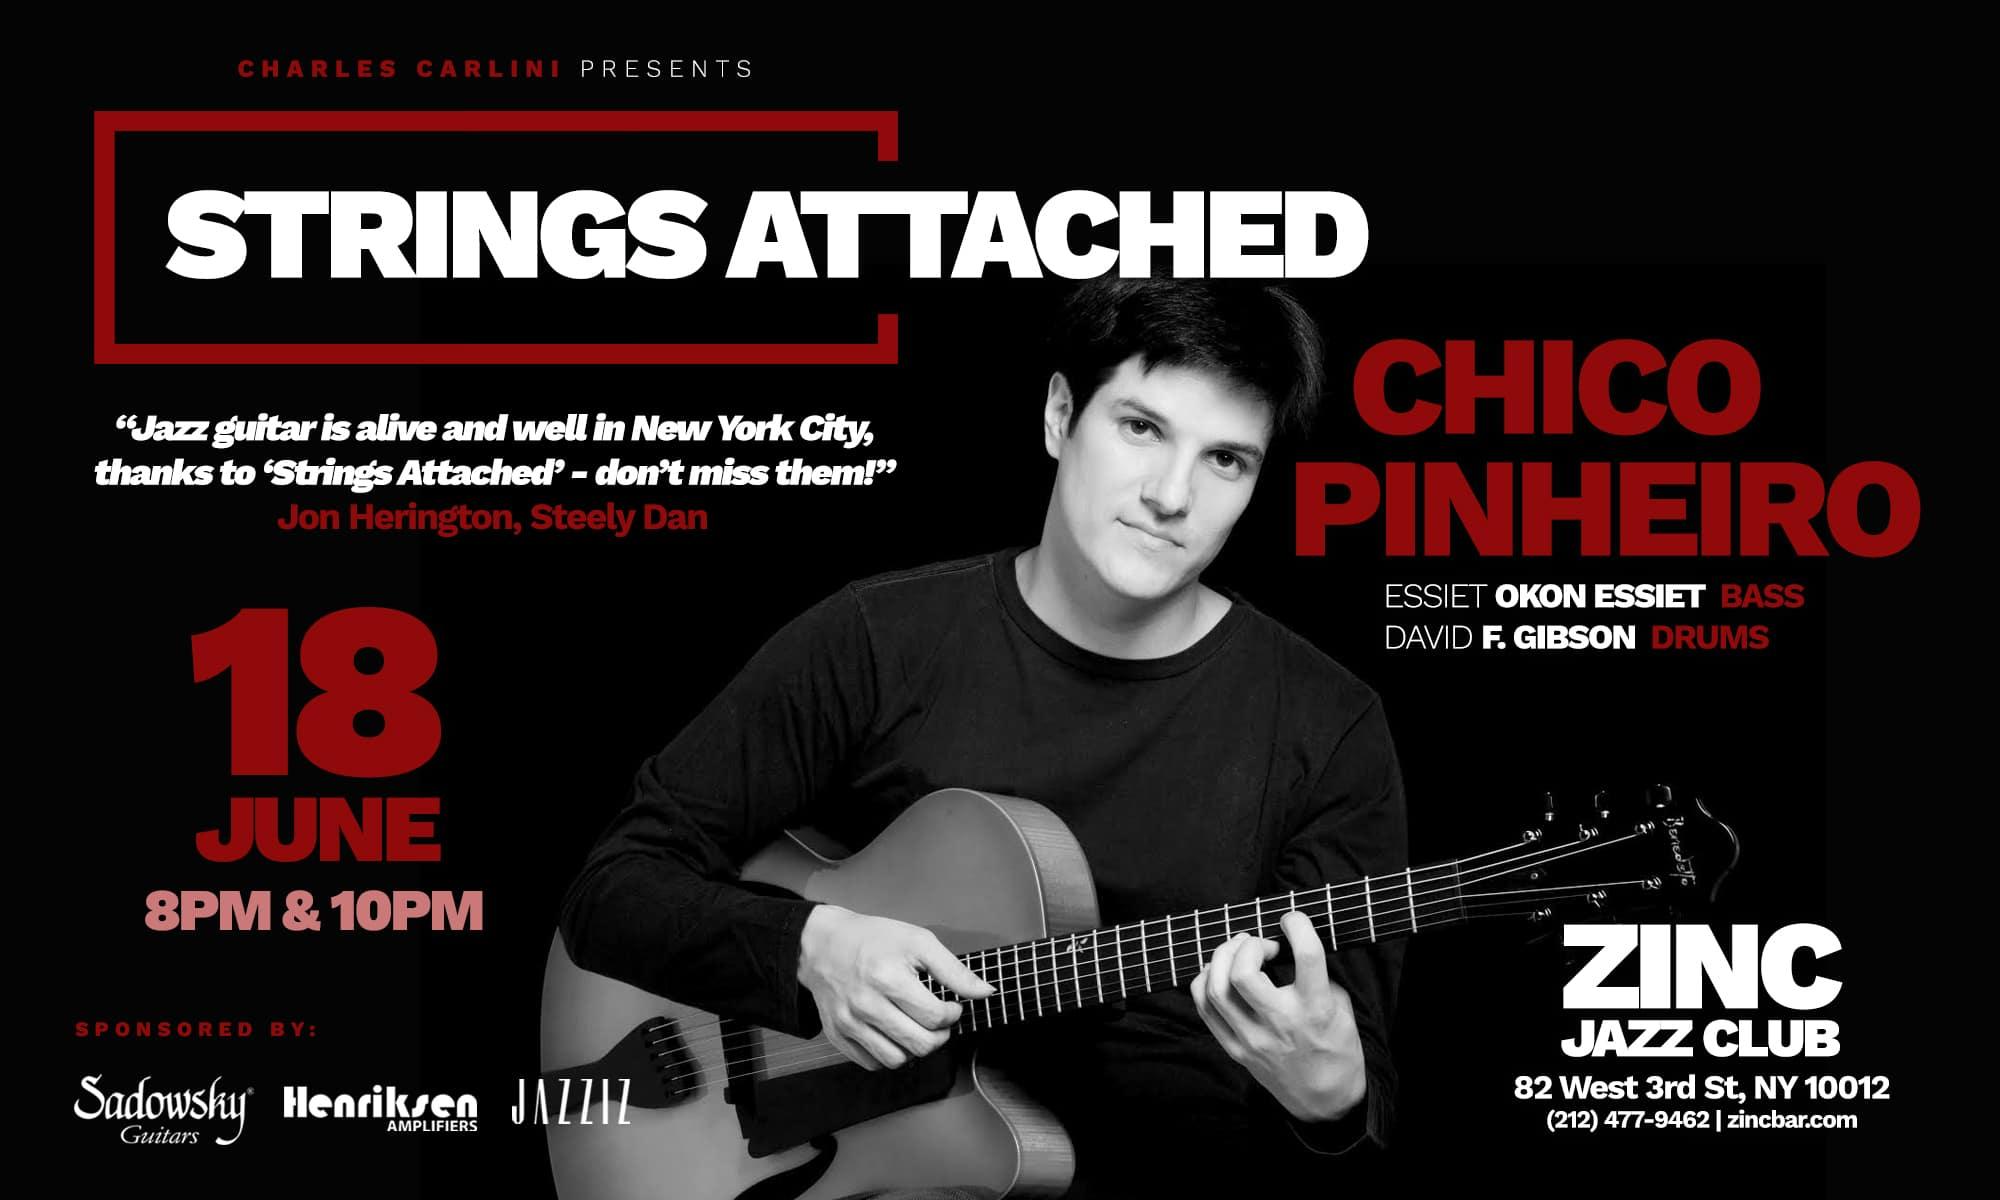 strings-attached-20180618-chico-pinheiro-eflyer